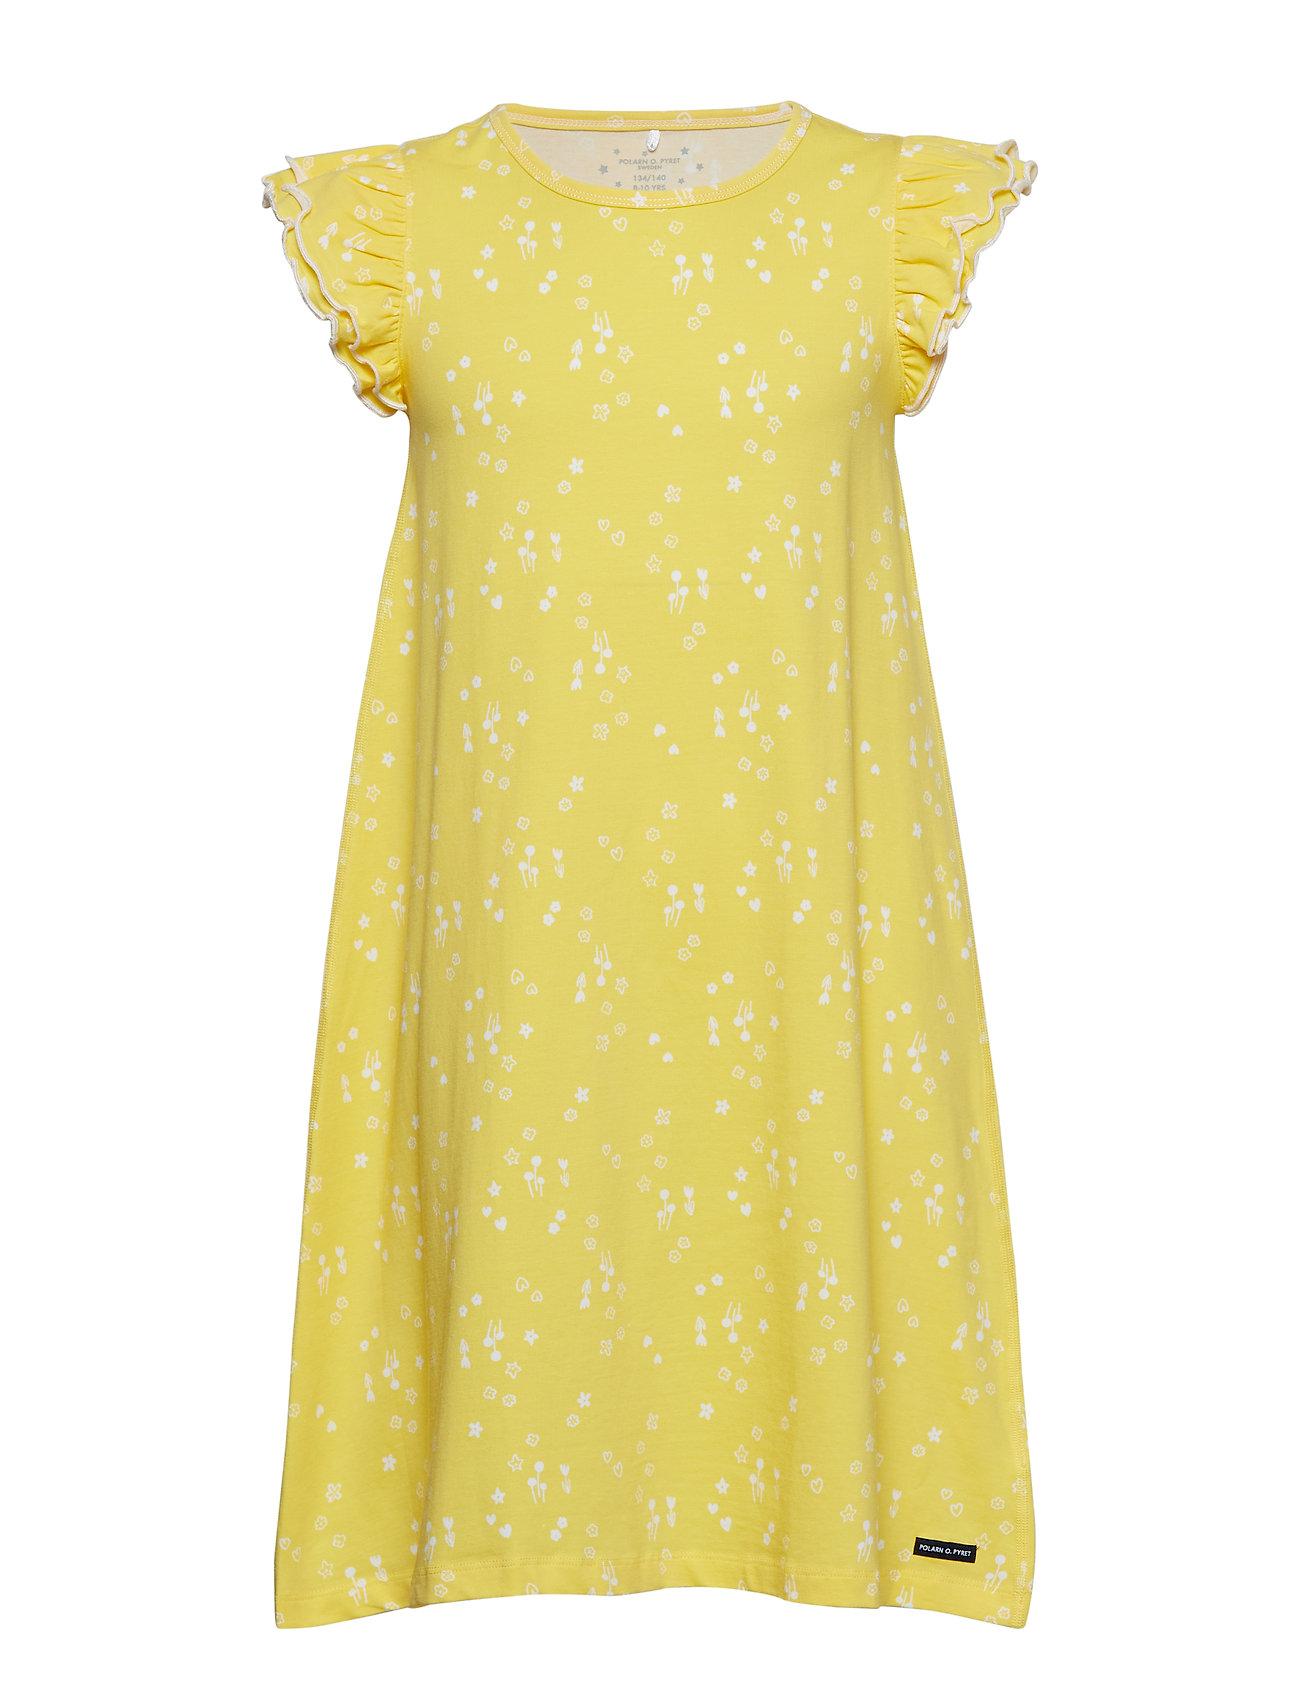 Polarn O. Pyret Nightdress with print